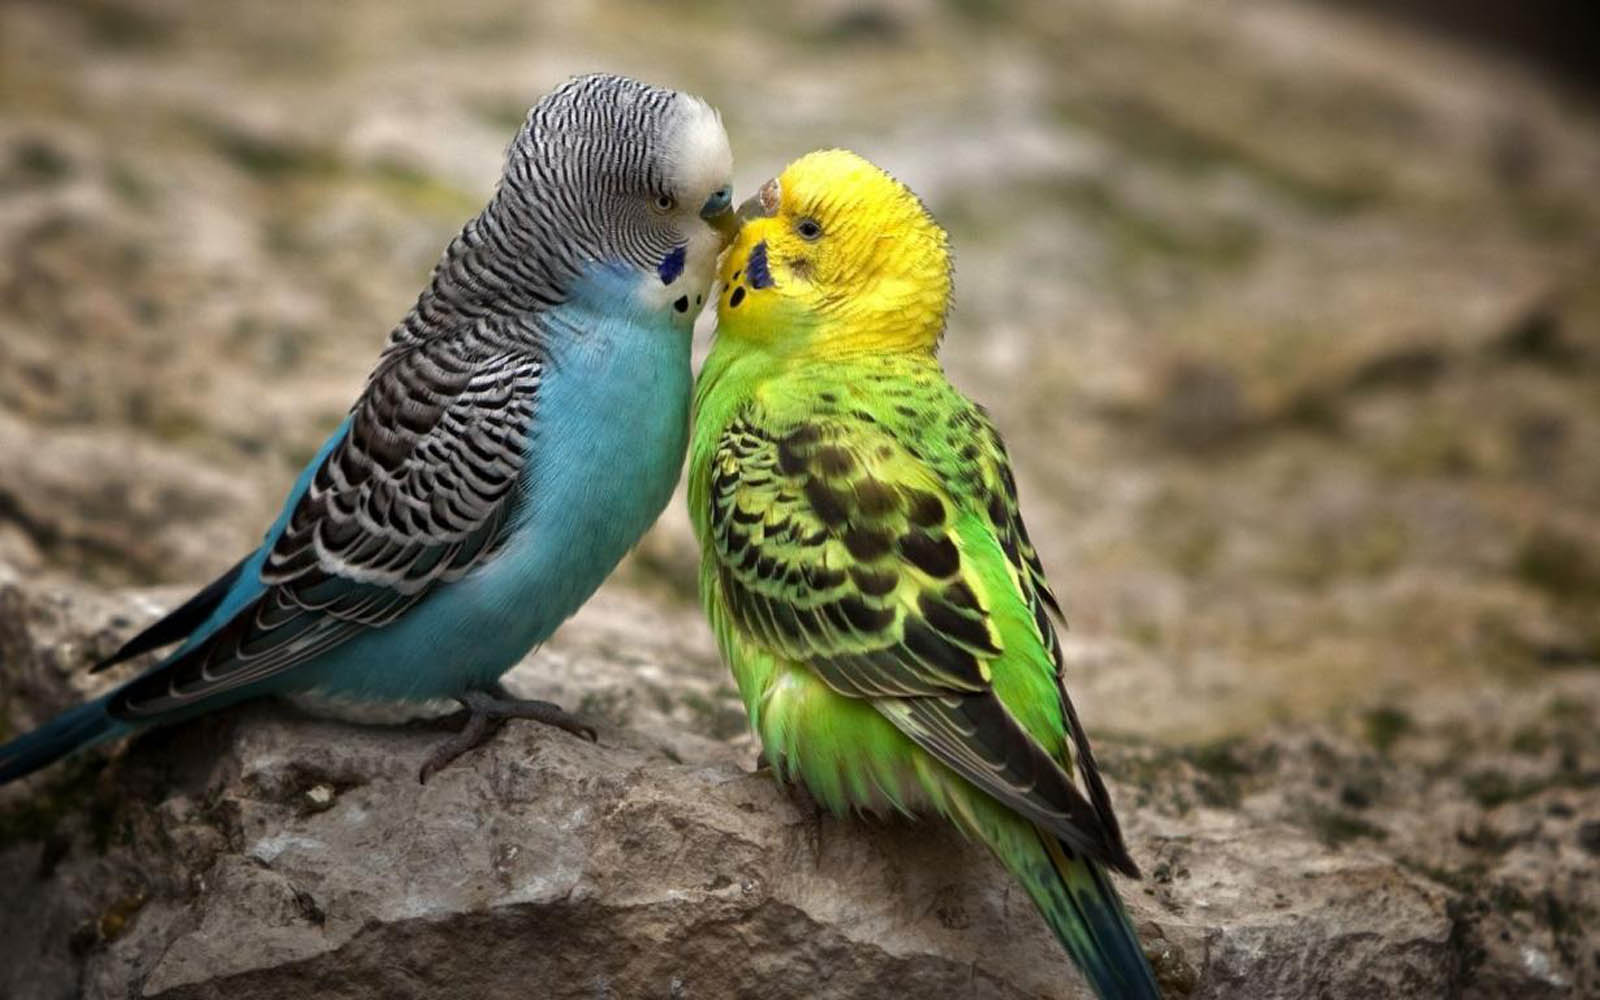 Sweet Parkeet Couple - Sweet Parkeet Couple